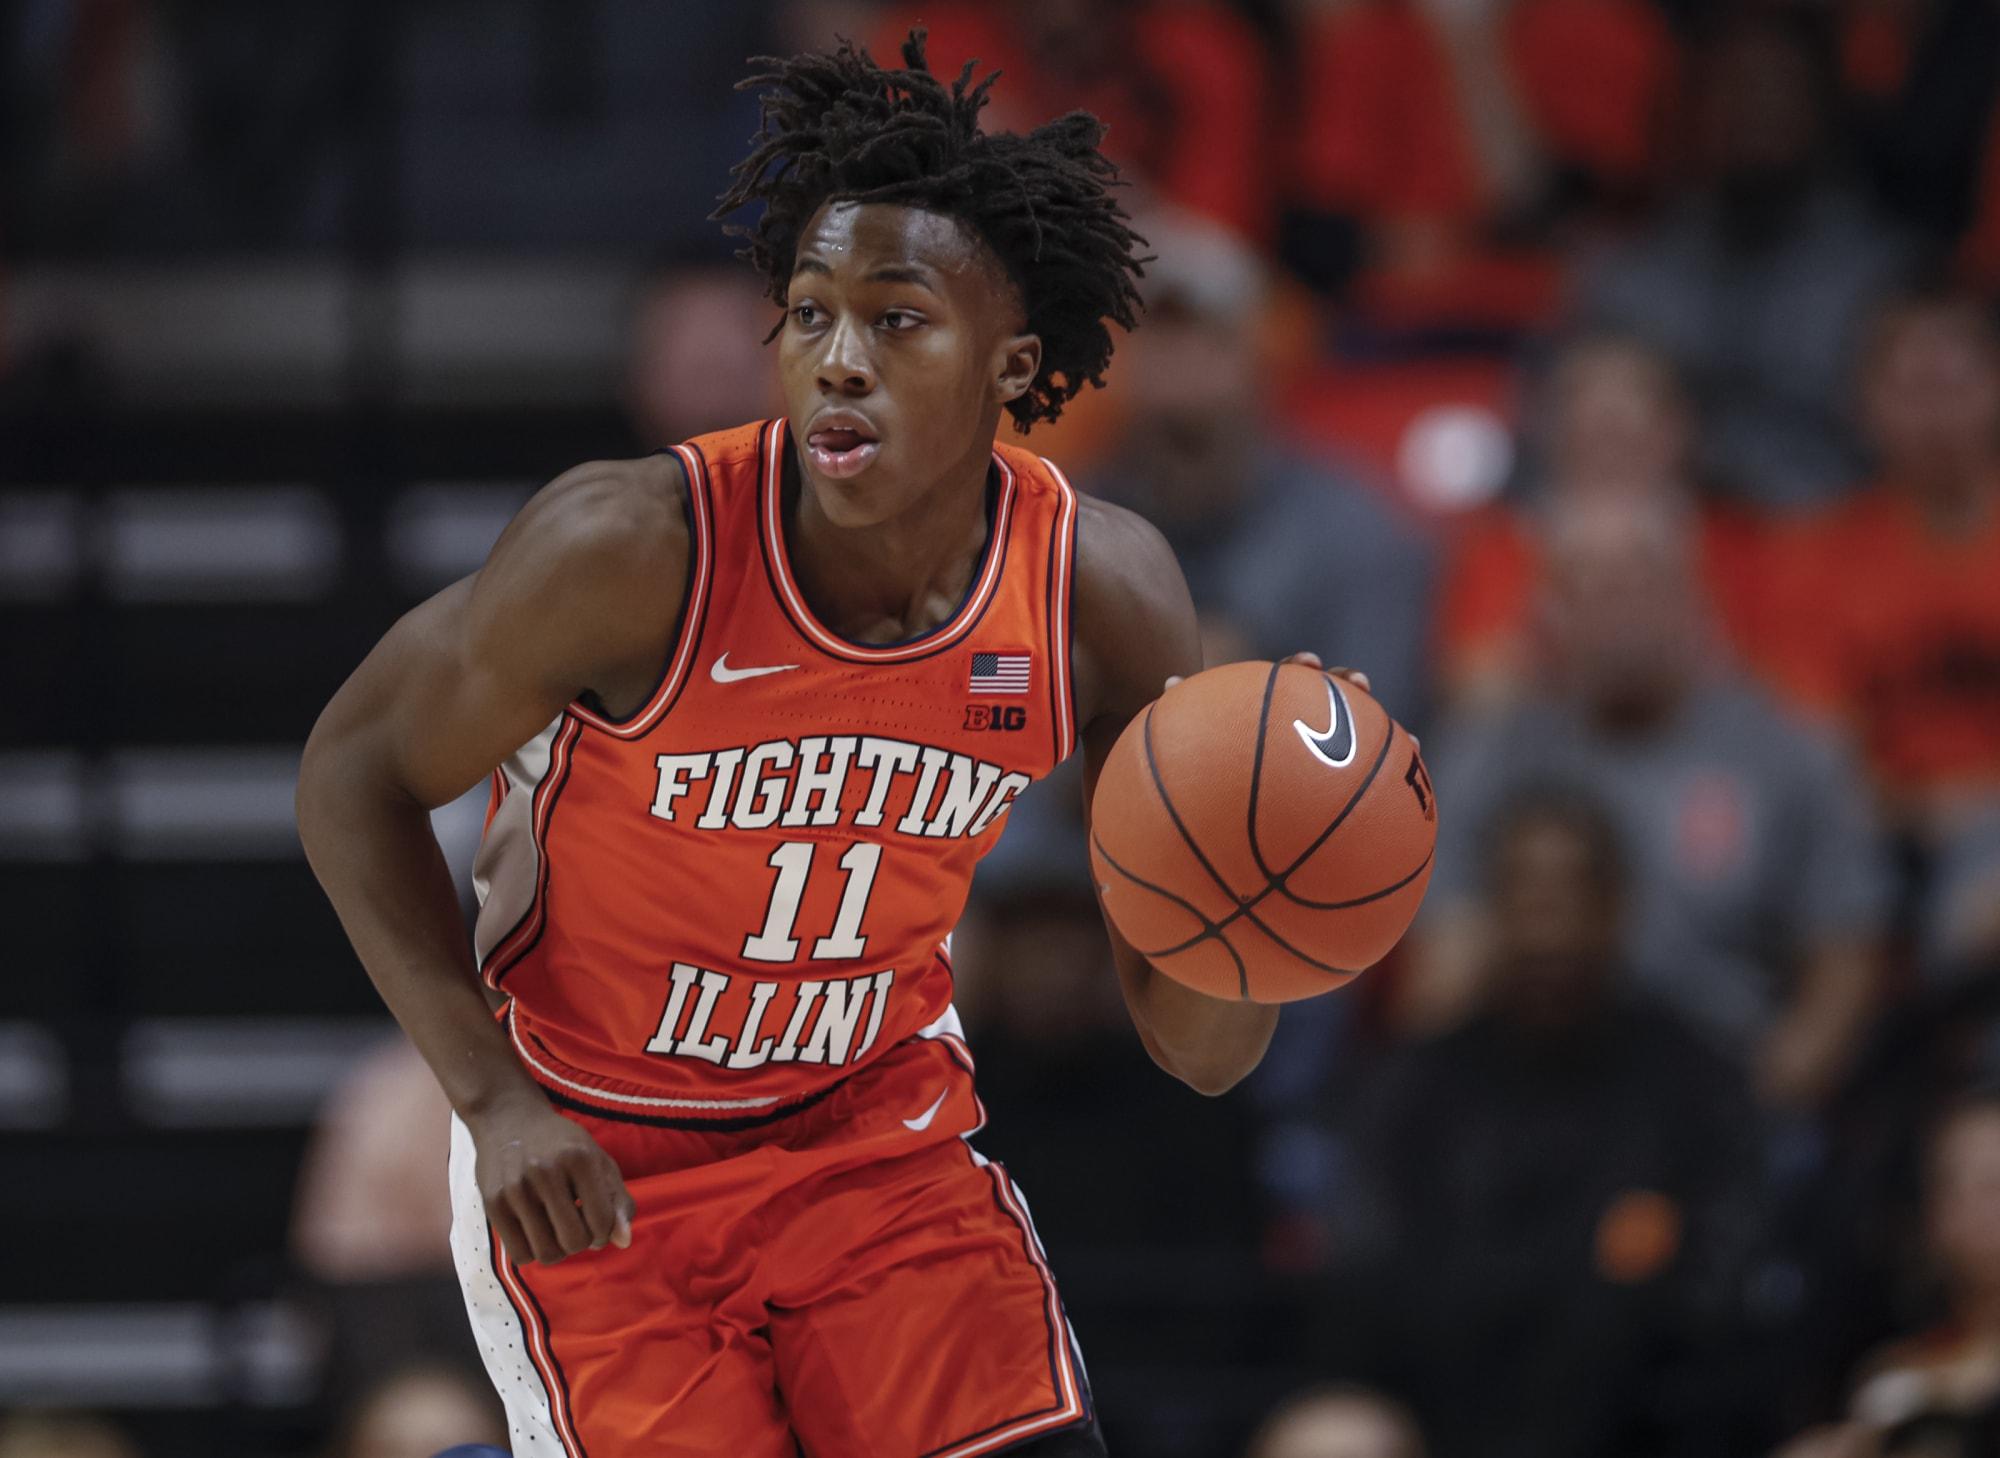 Illinois Basketball: Illini rise rapidly in new ESPN top 25